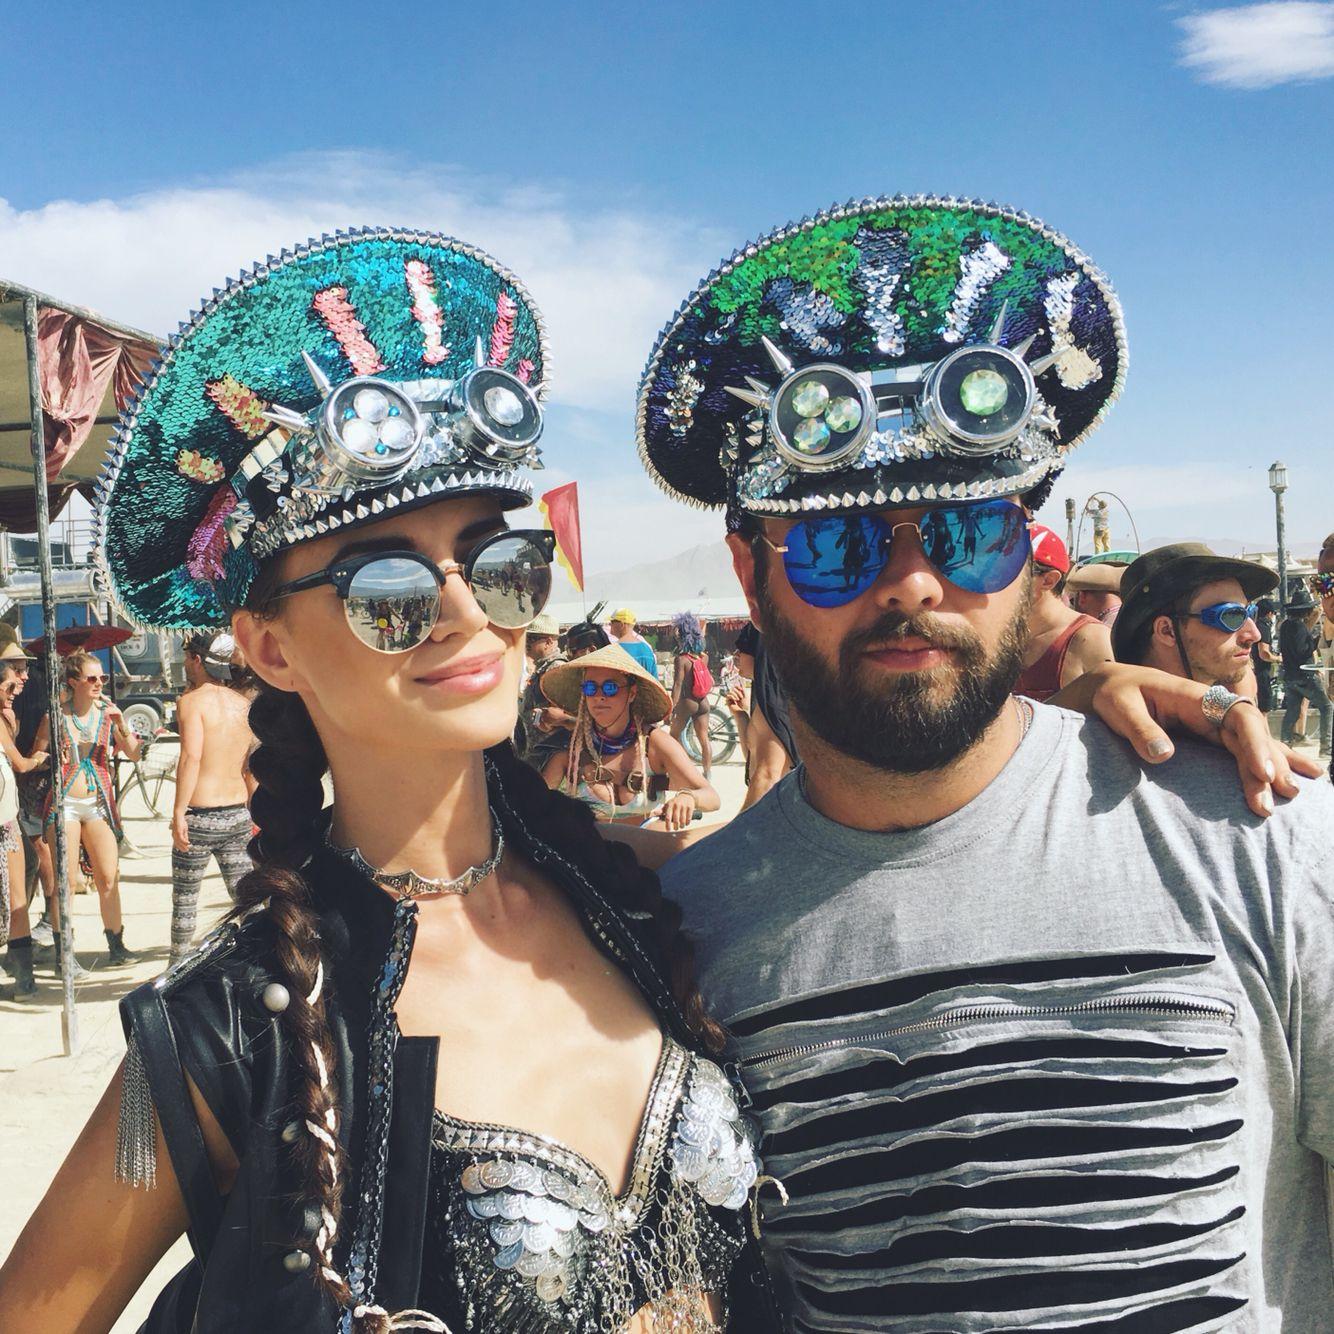 b91bea251a9 Burninghats   Burning Man Unique handmade hats for burning man and festivals .